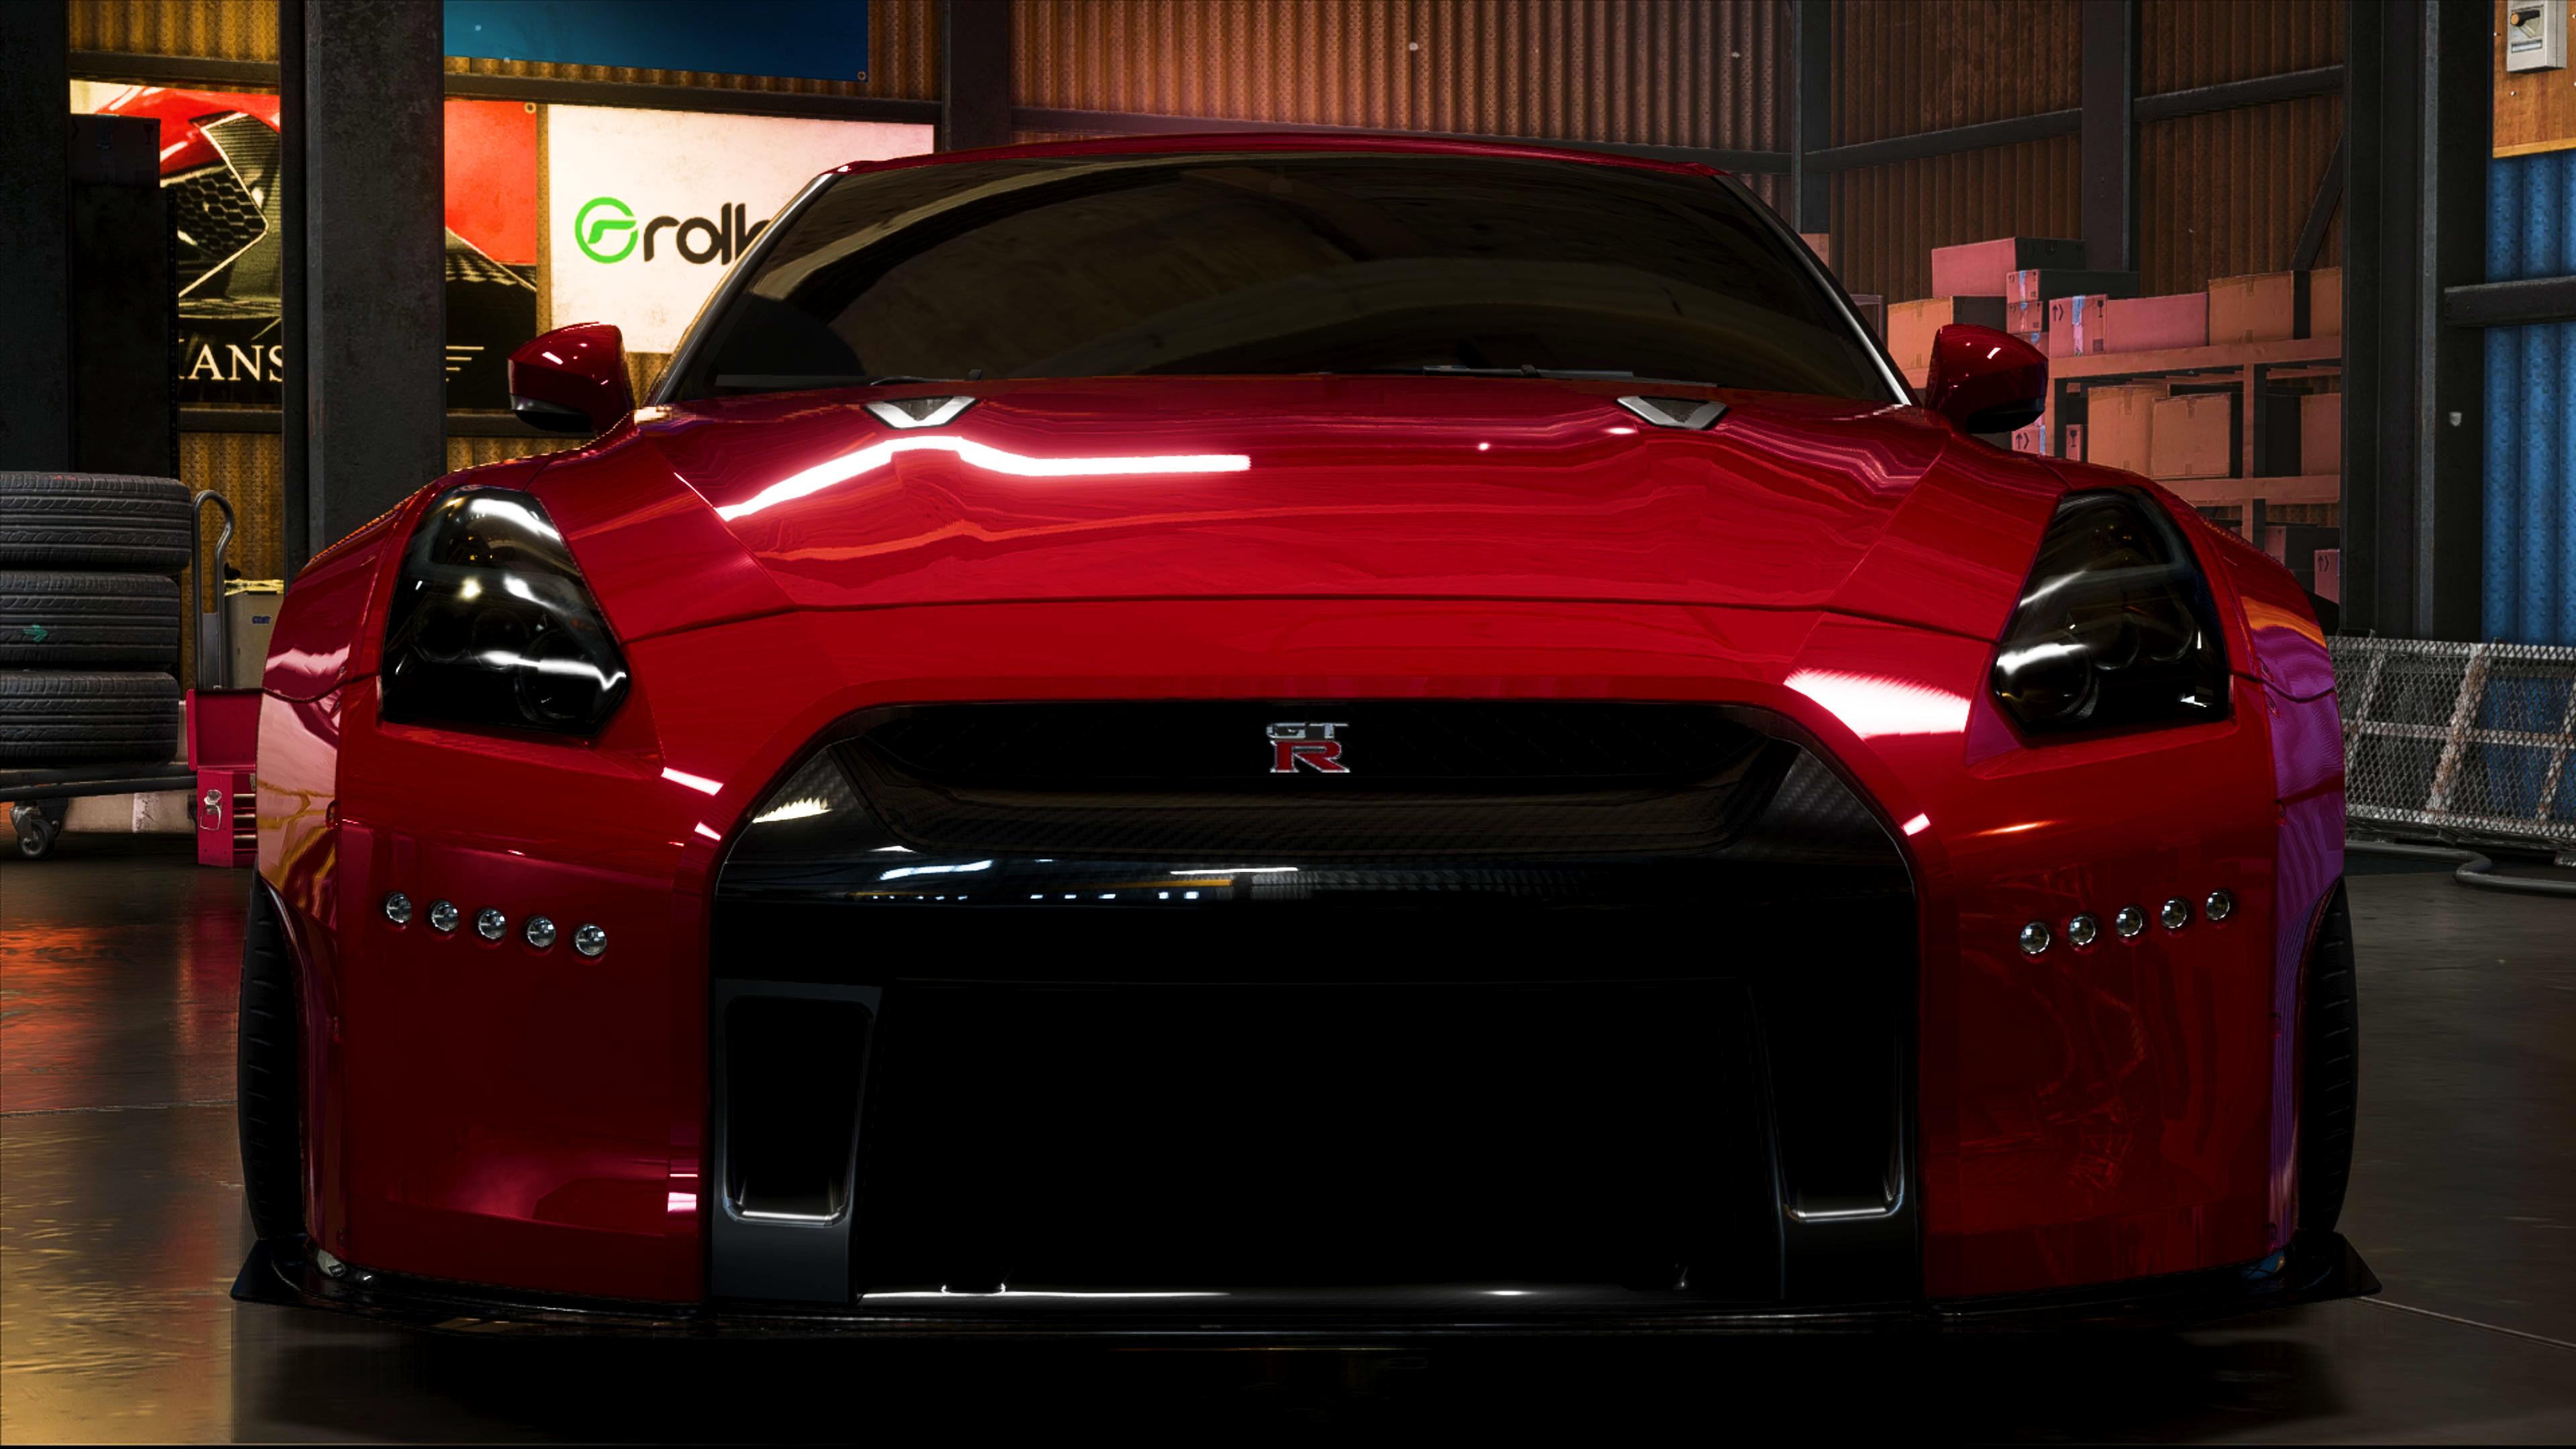 Nissan GTR Rocket Bunny Red Car